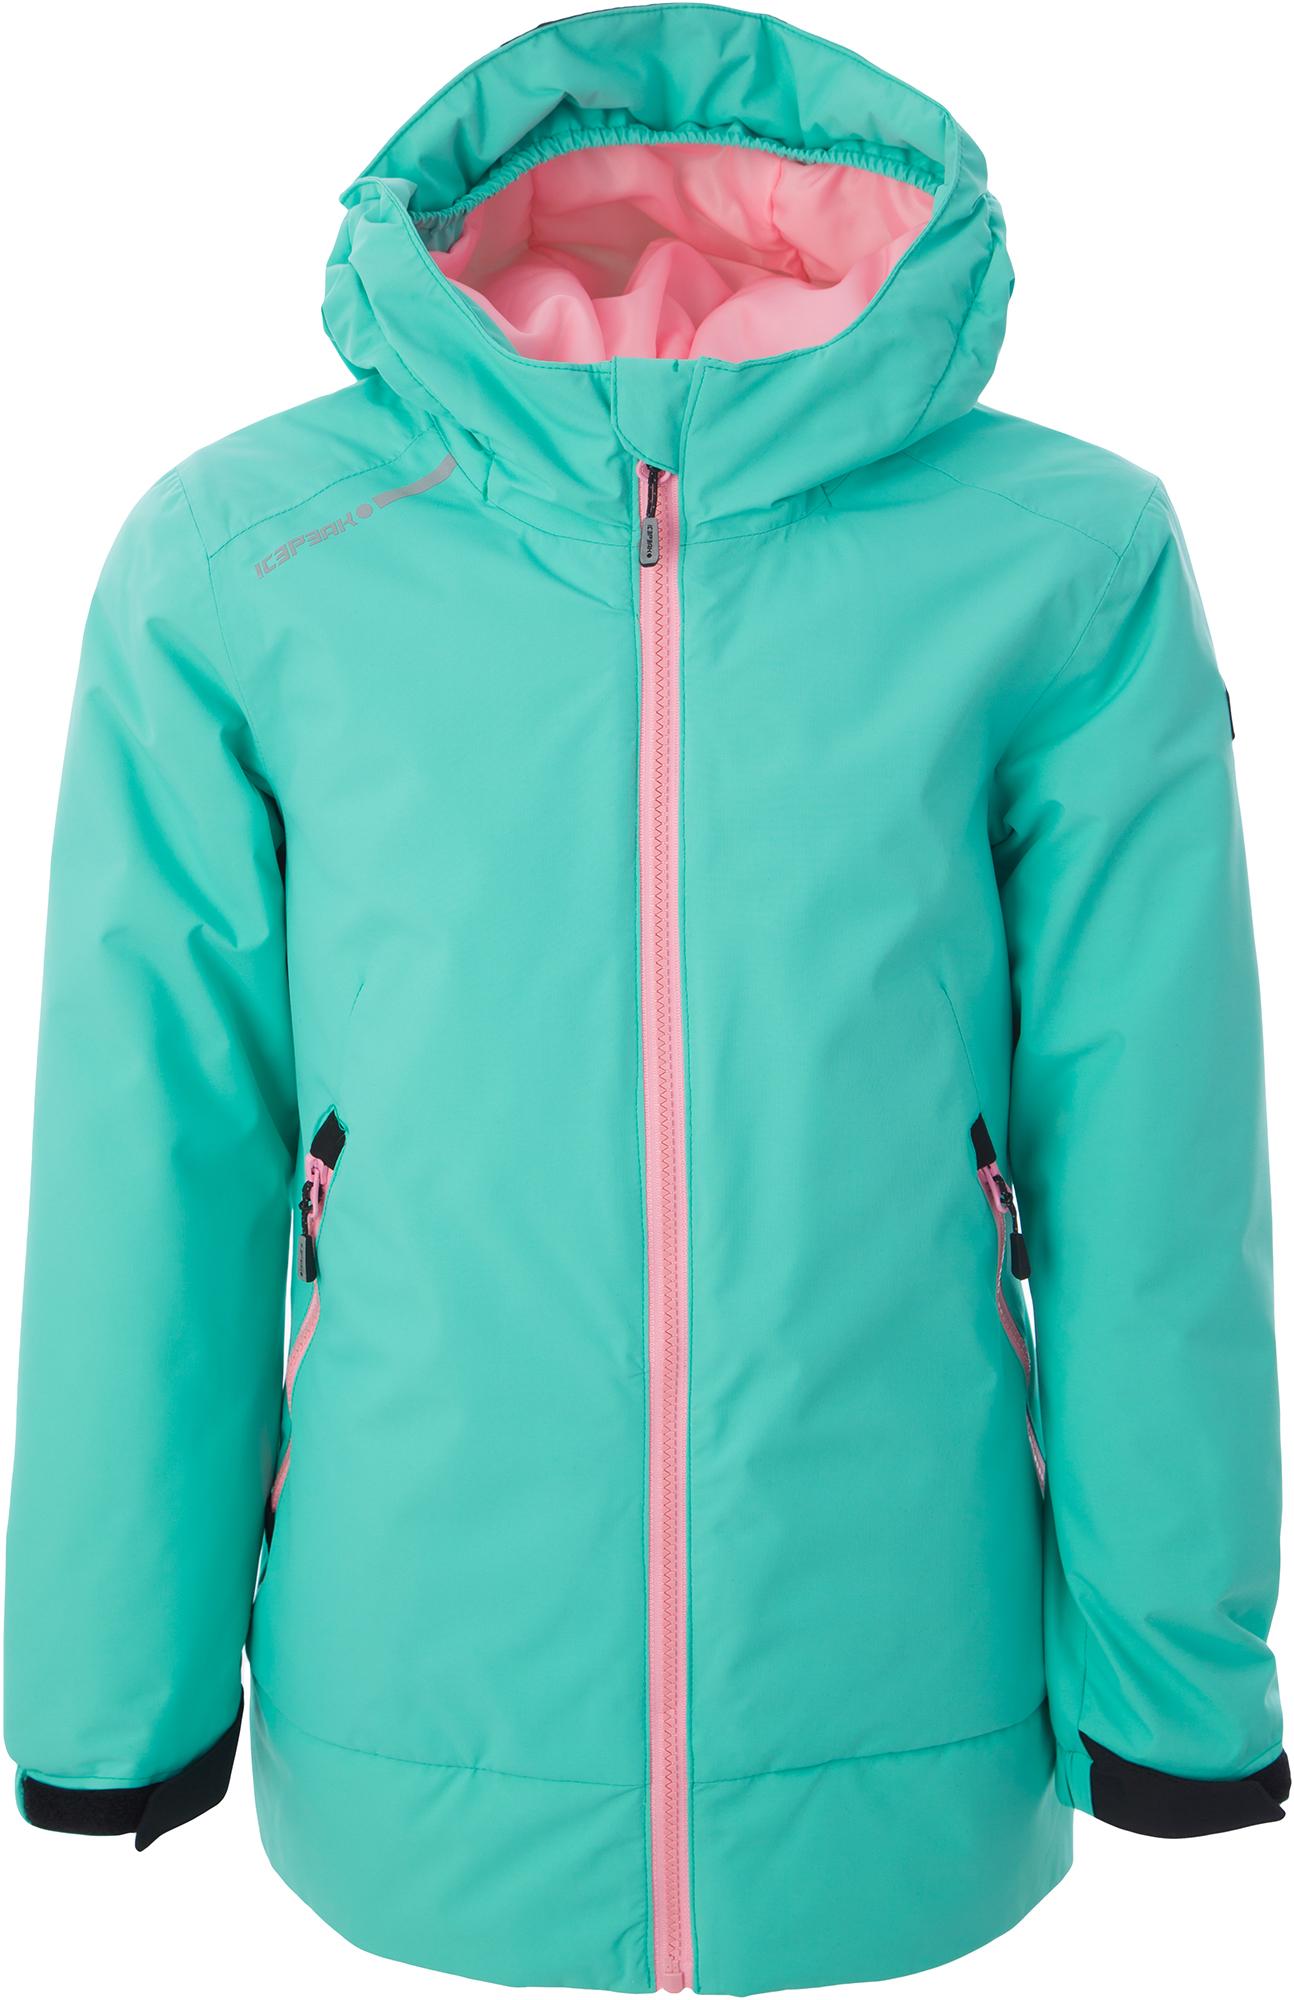 IcePeak Куртка утепленная для девочек IcePeak Tierra, размер 164 icepeak рюкзак icepeak ilma размер без размера